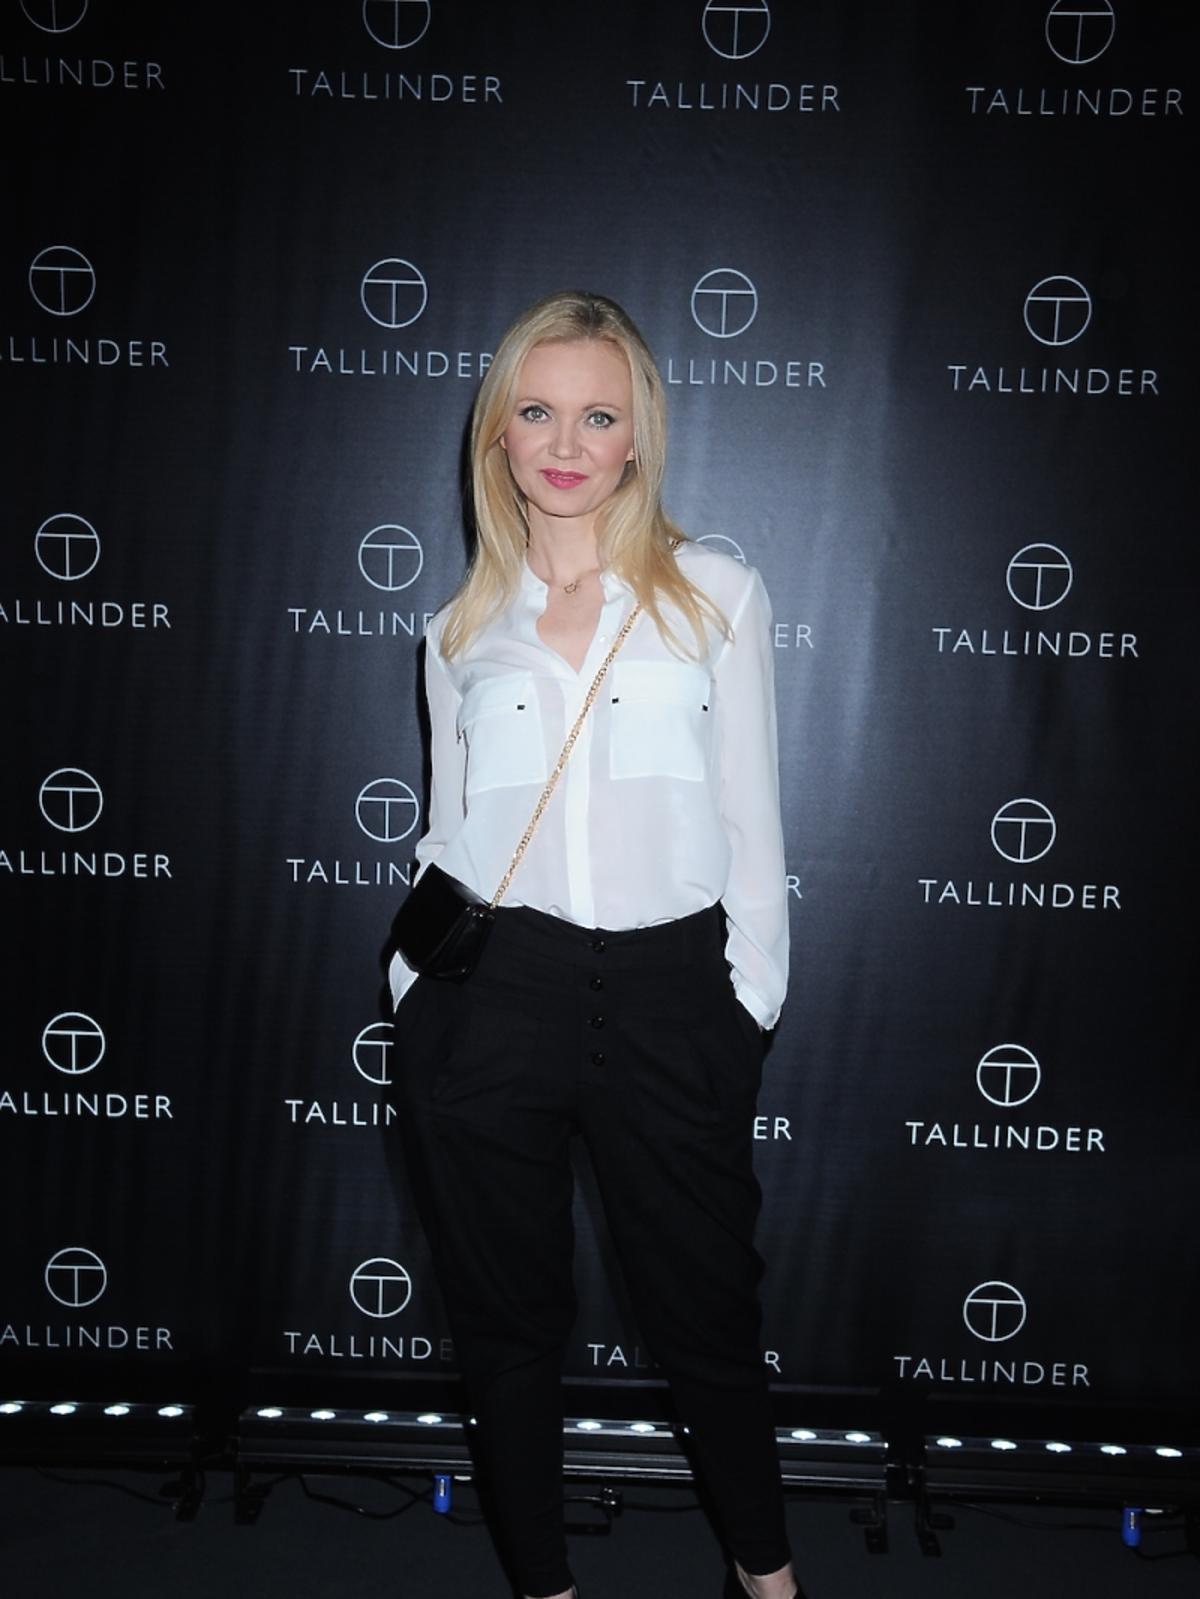 Olga Borys na prezentacji marki Tallinder